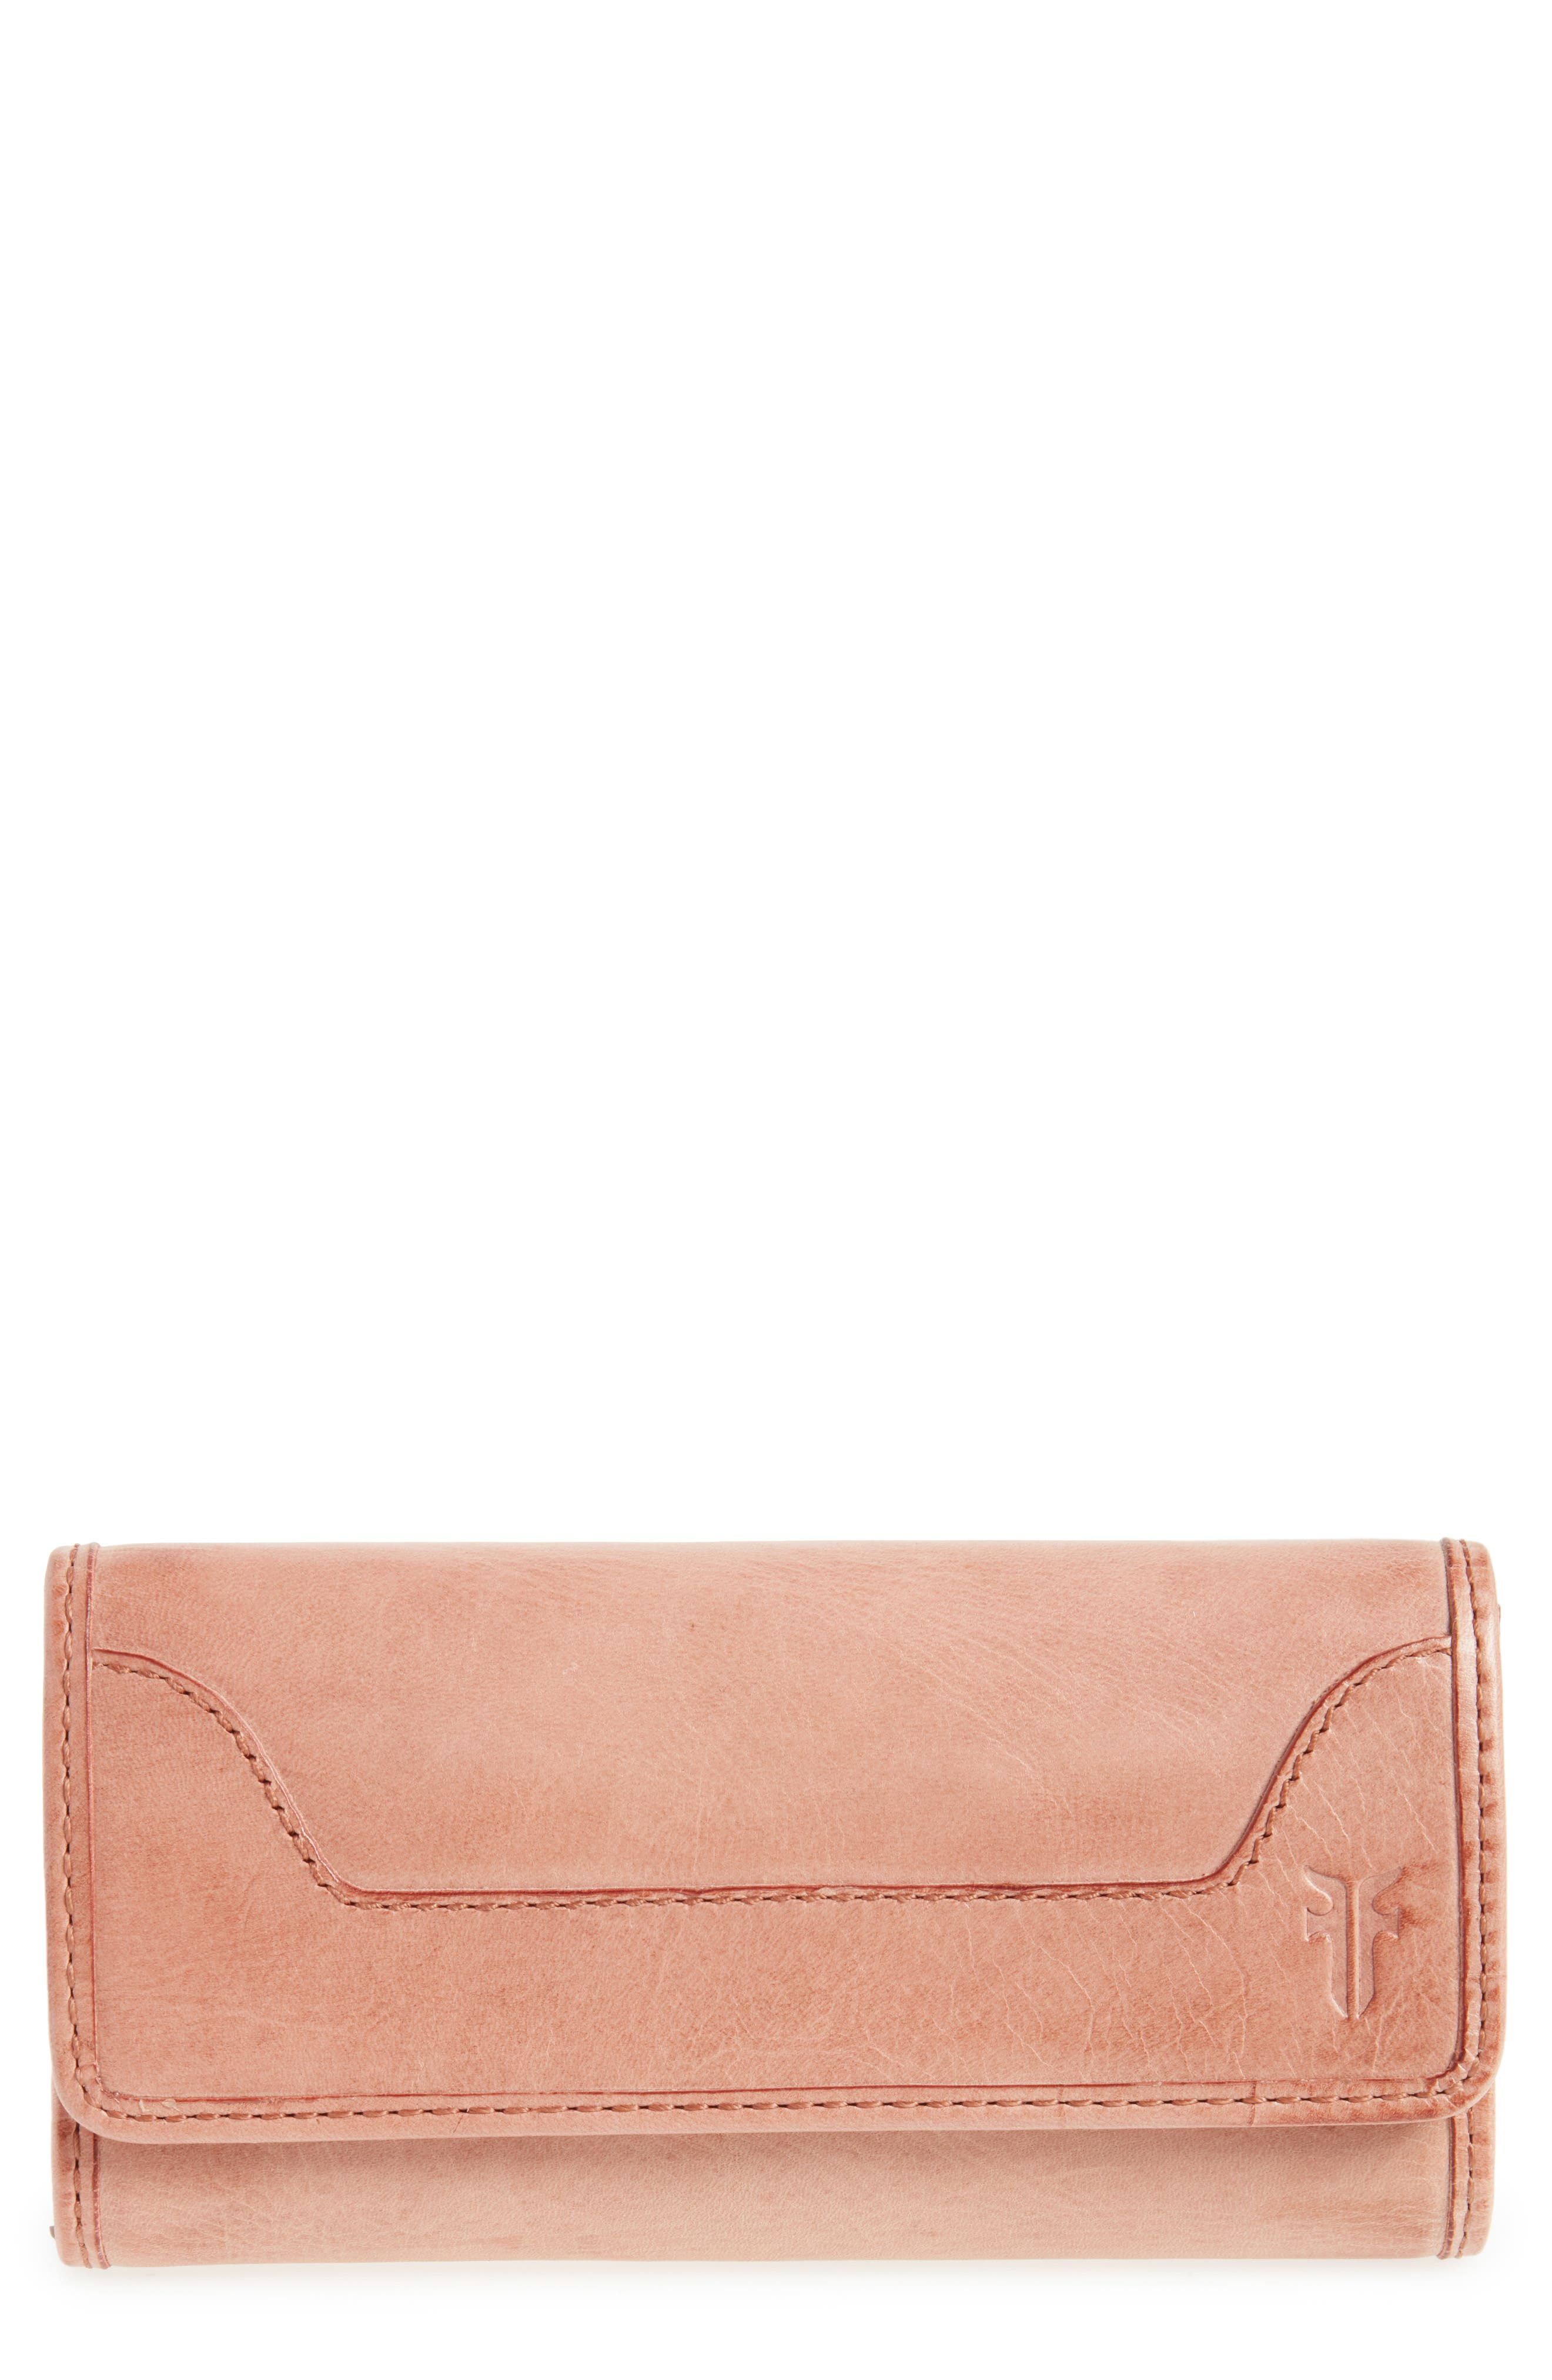 'Melissa' Continental Wallet,                             Main thumbnail 1, color,                             DUSTY ROSE